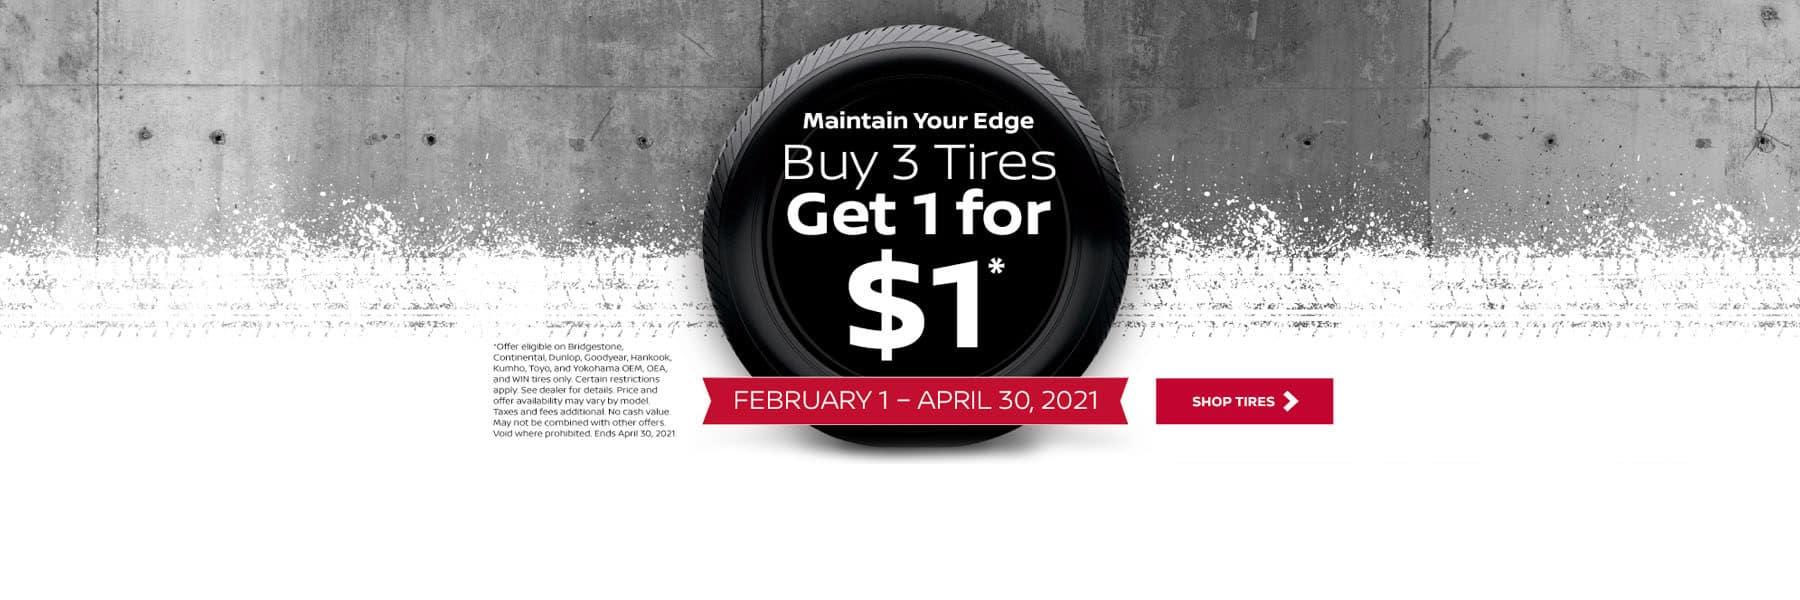 Nissan Auto Tire Service Special for Denver, CO